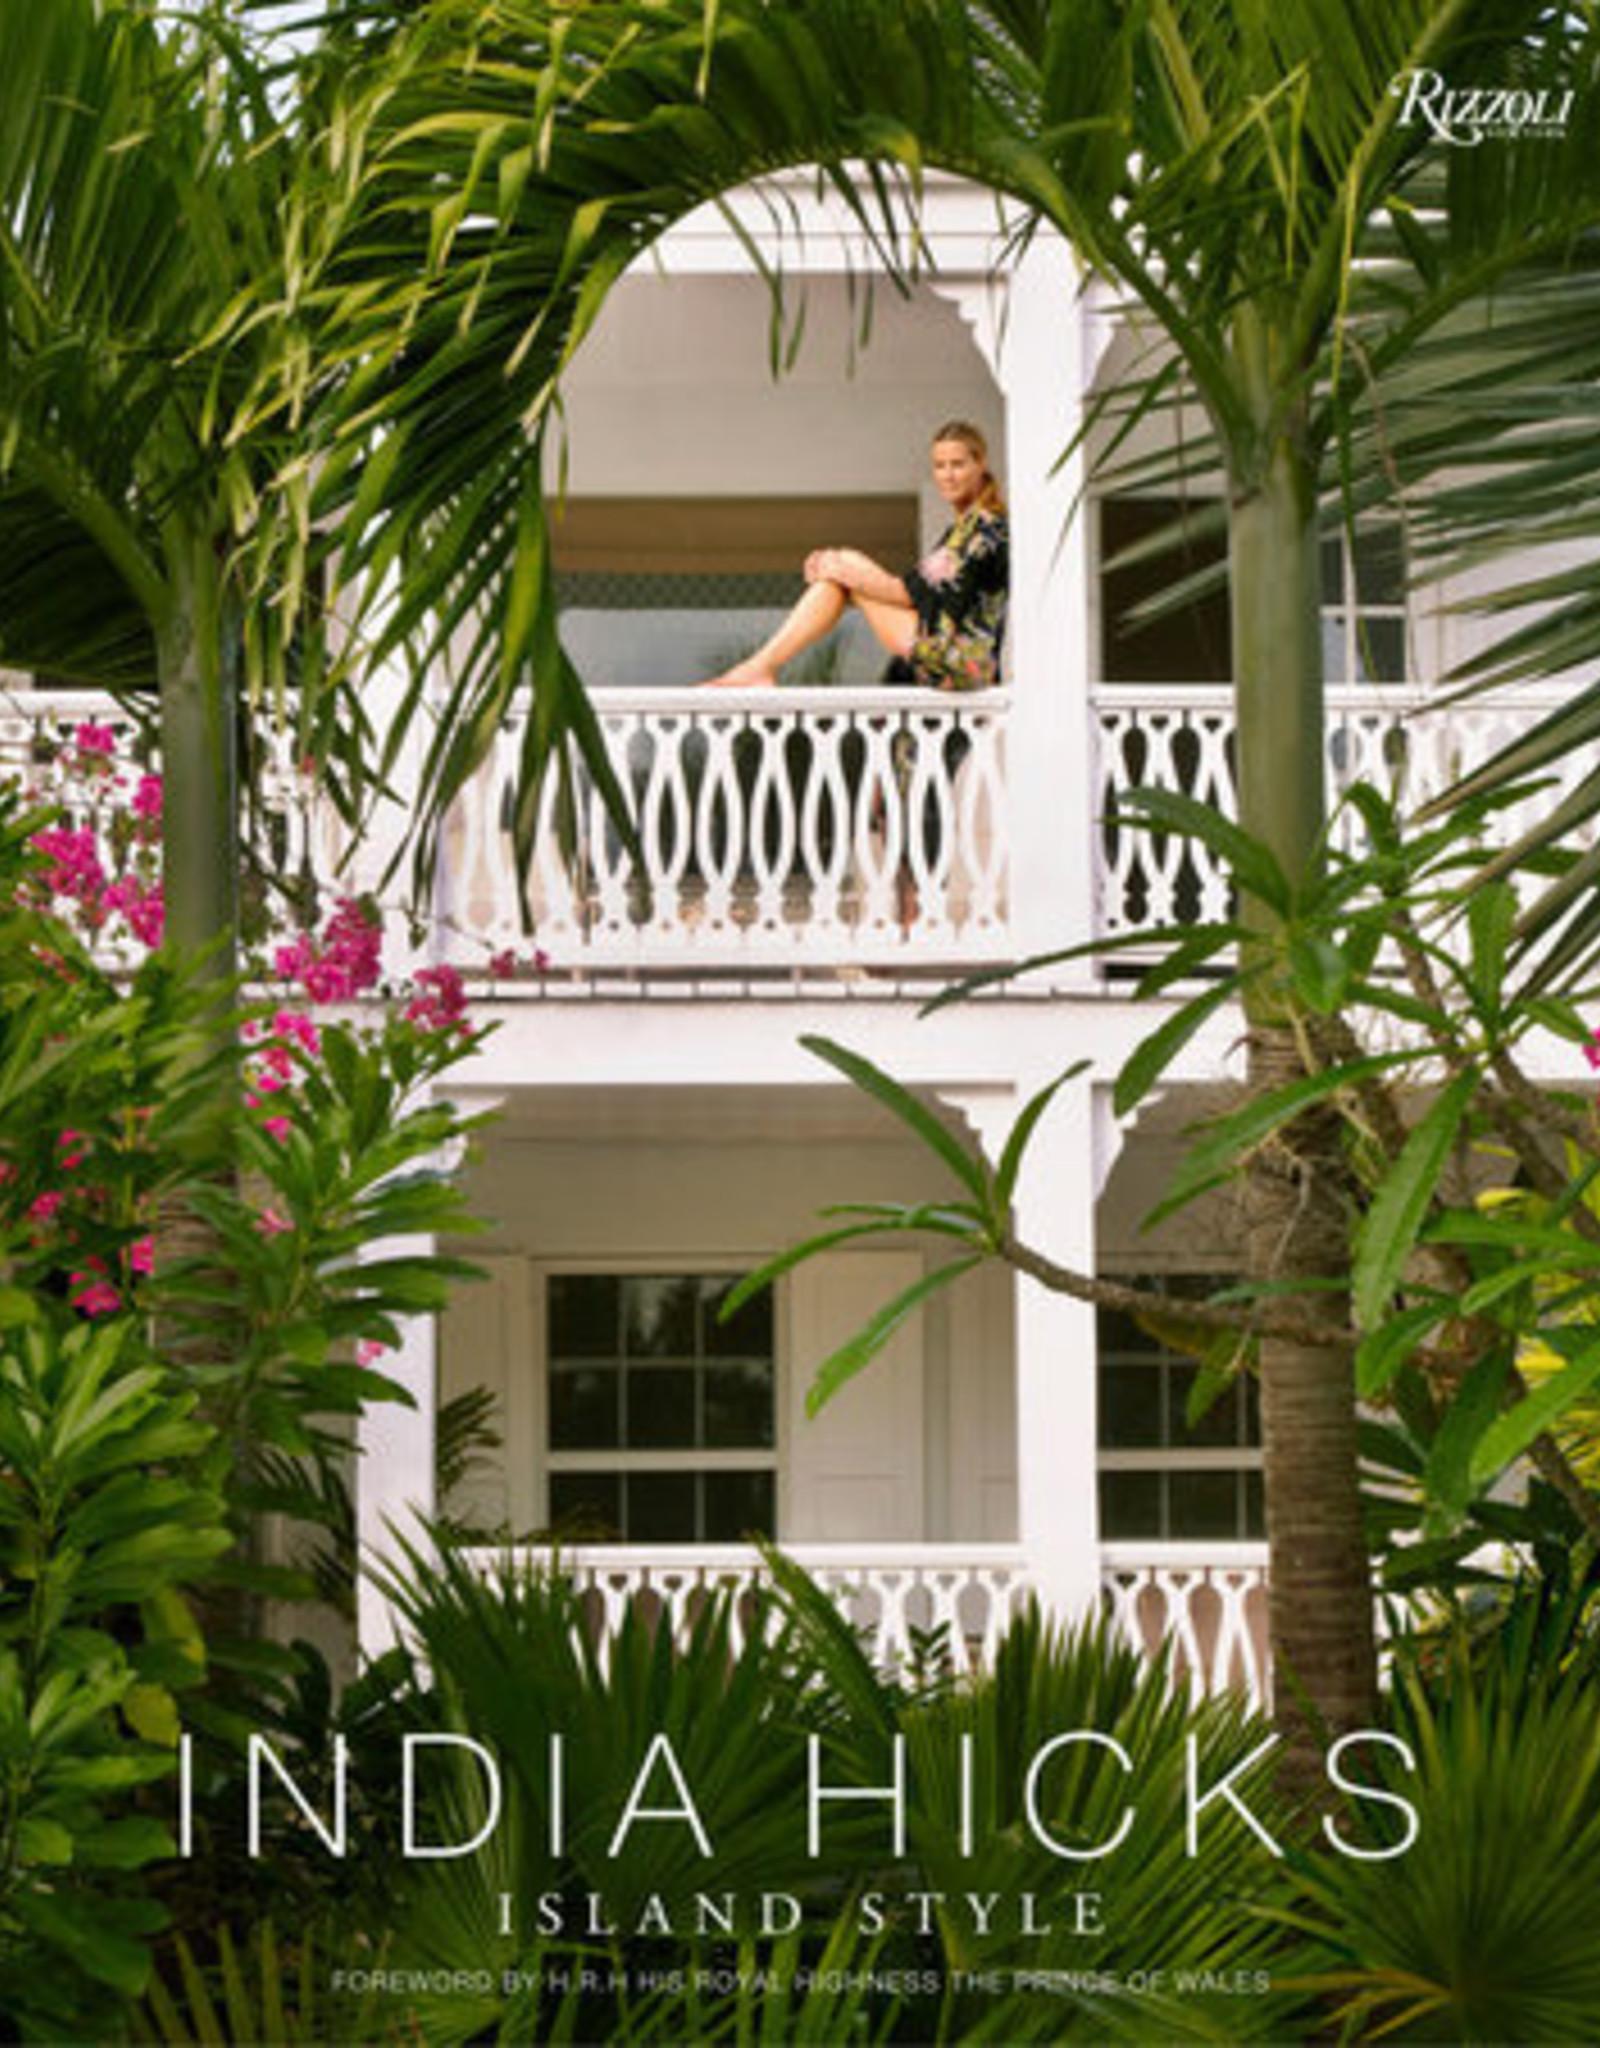 Penguin Random House India Hicks: Island Style